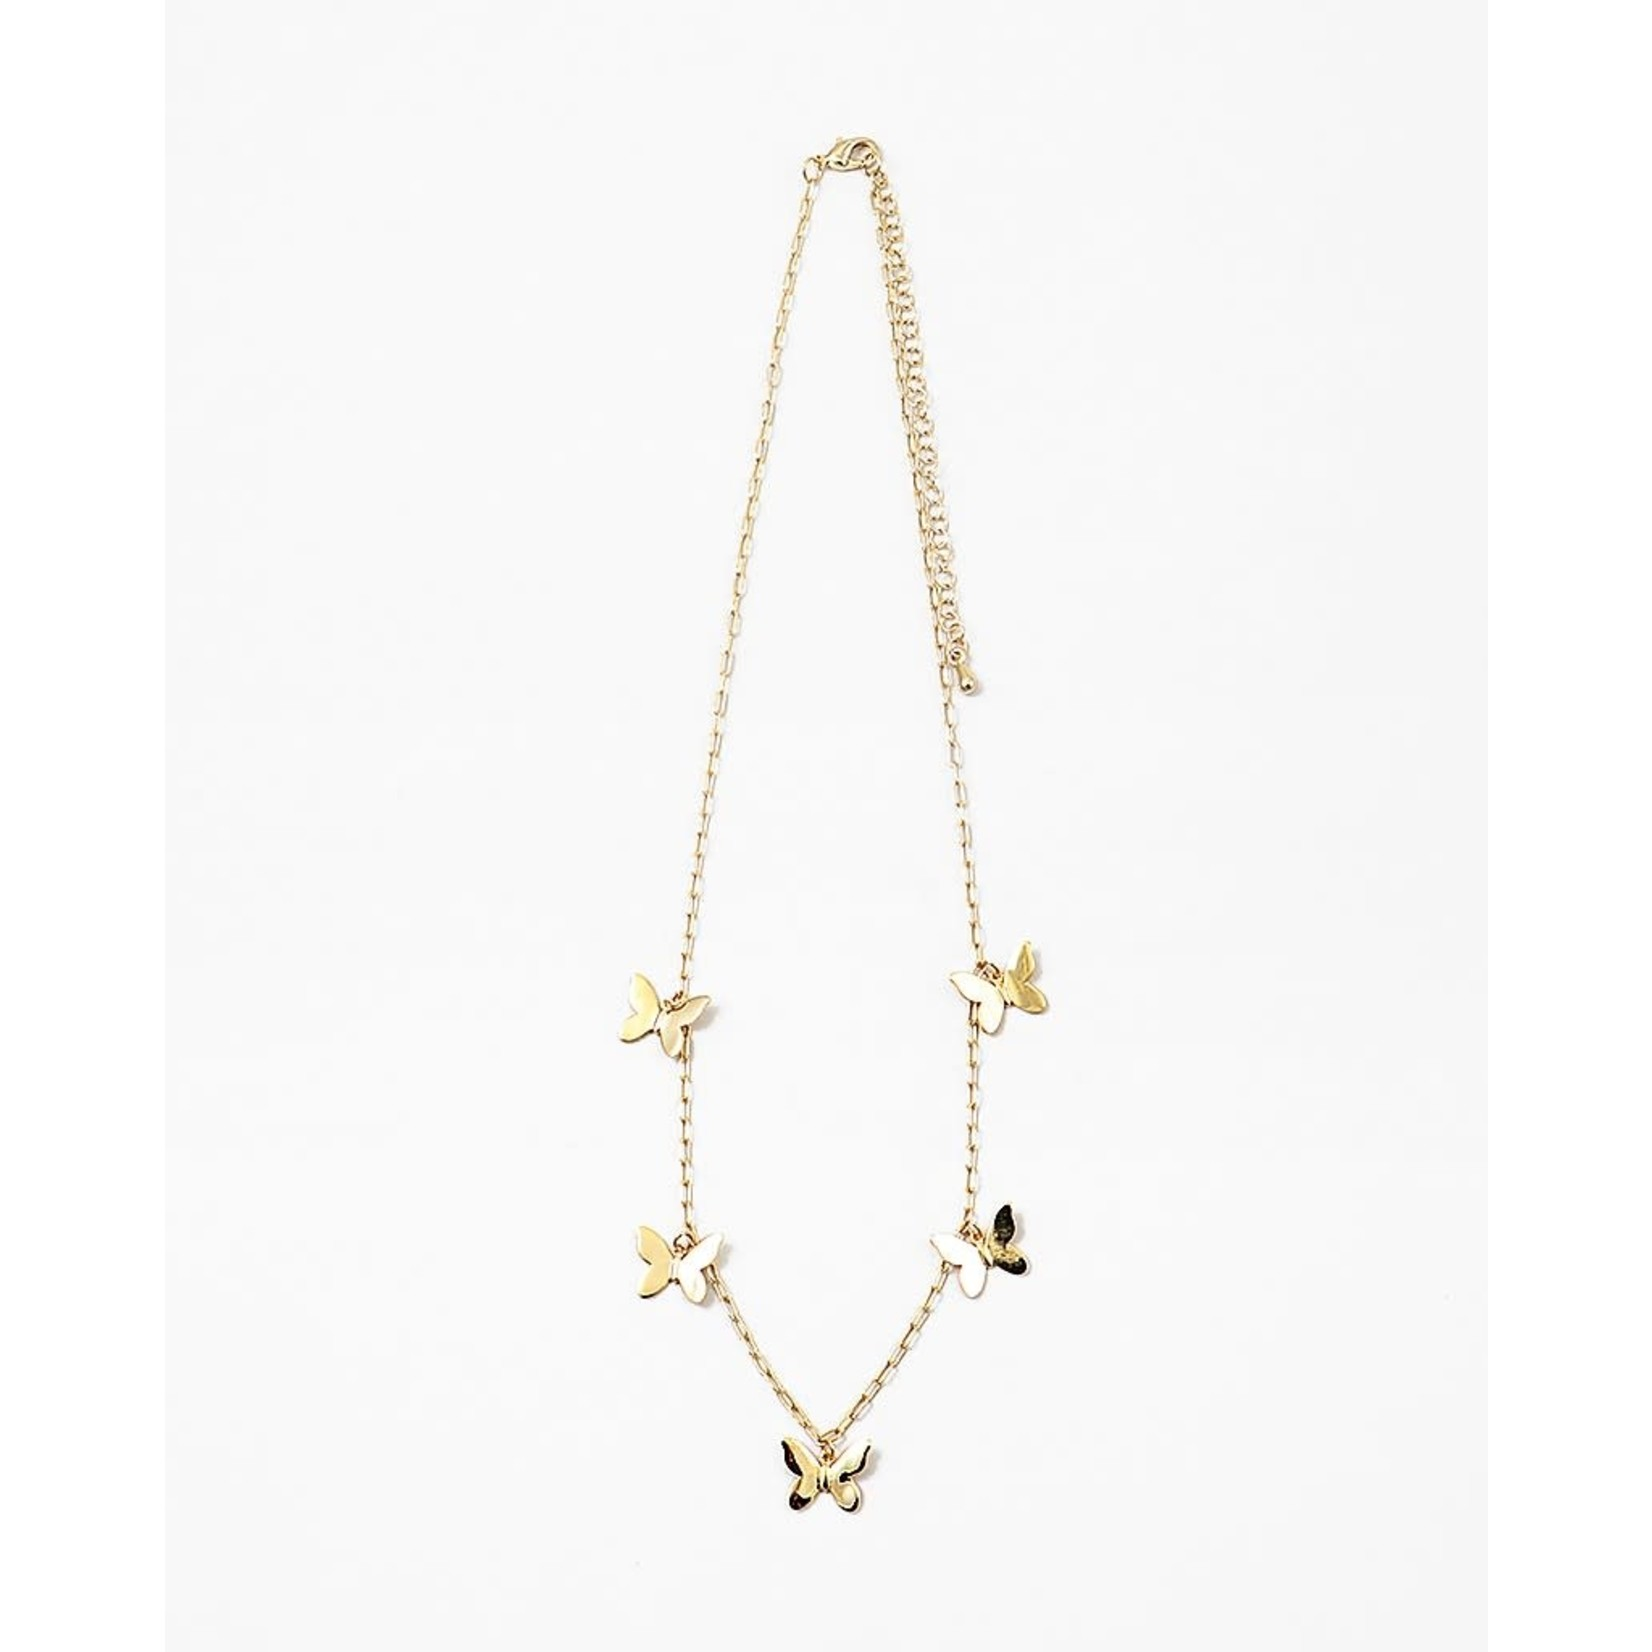 EM & ELLE Gold Link and Butterfly Necklace